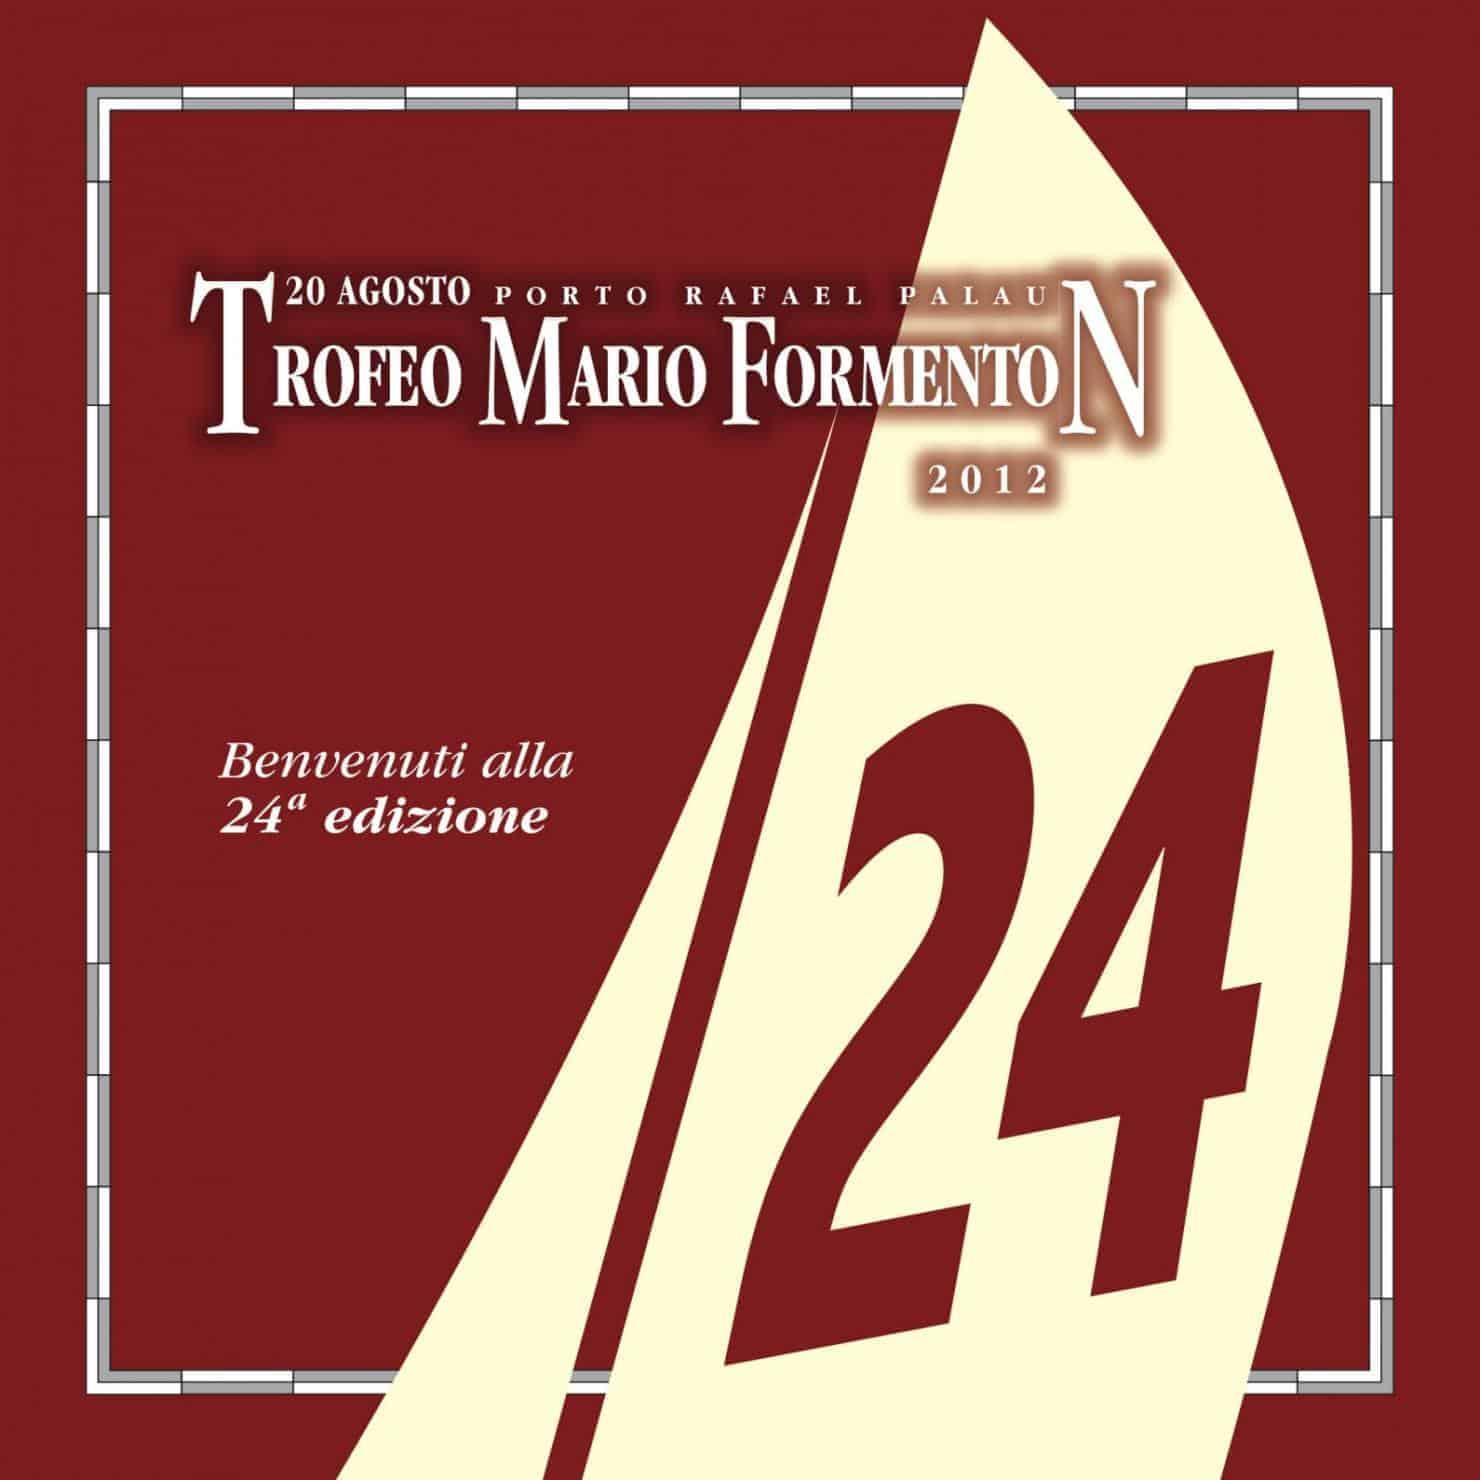 trofeo-2012-copertina-24